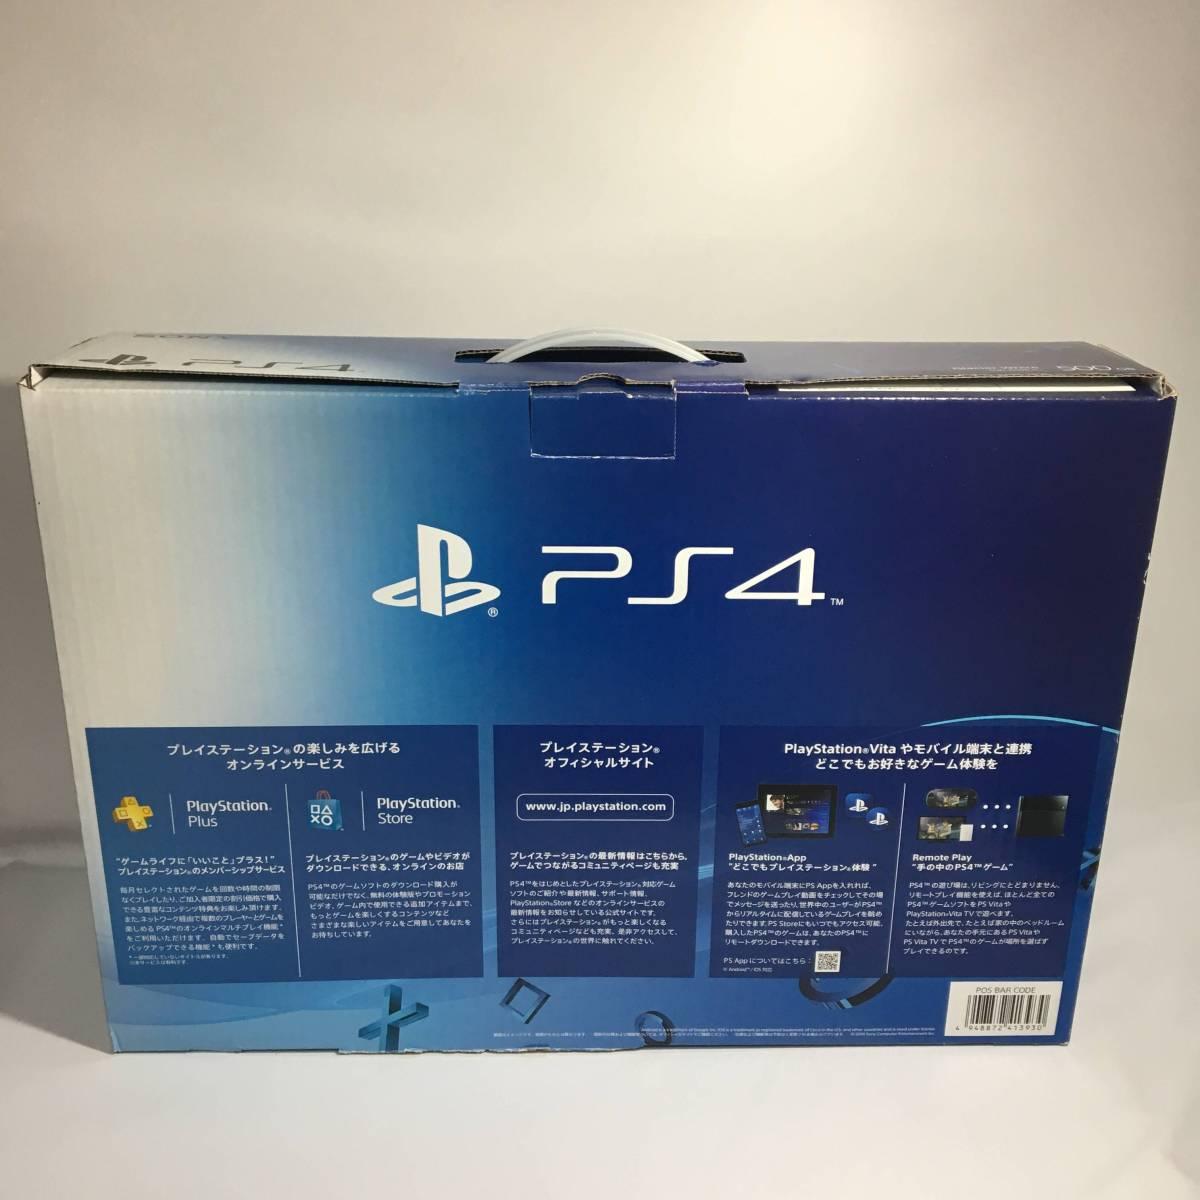 PS4 プレイステーション4 CUH-1100A 500GB 本体 ケーブルセット ホワイト 白 まとめ ソニー ソフト プレステ 中古 Pro VR_画像9